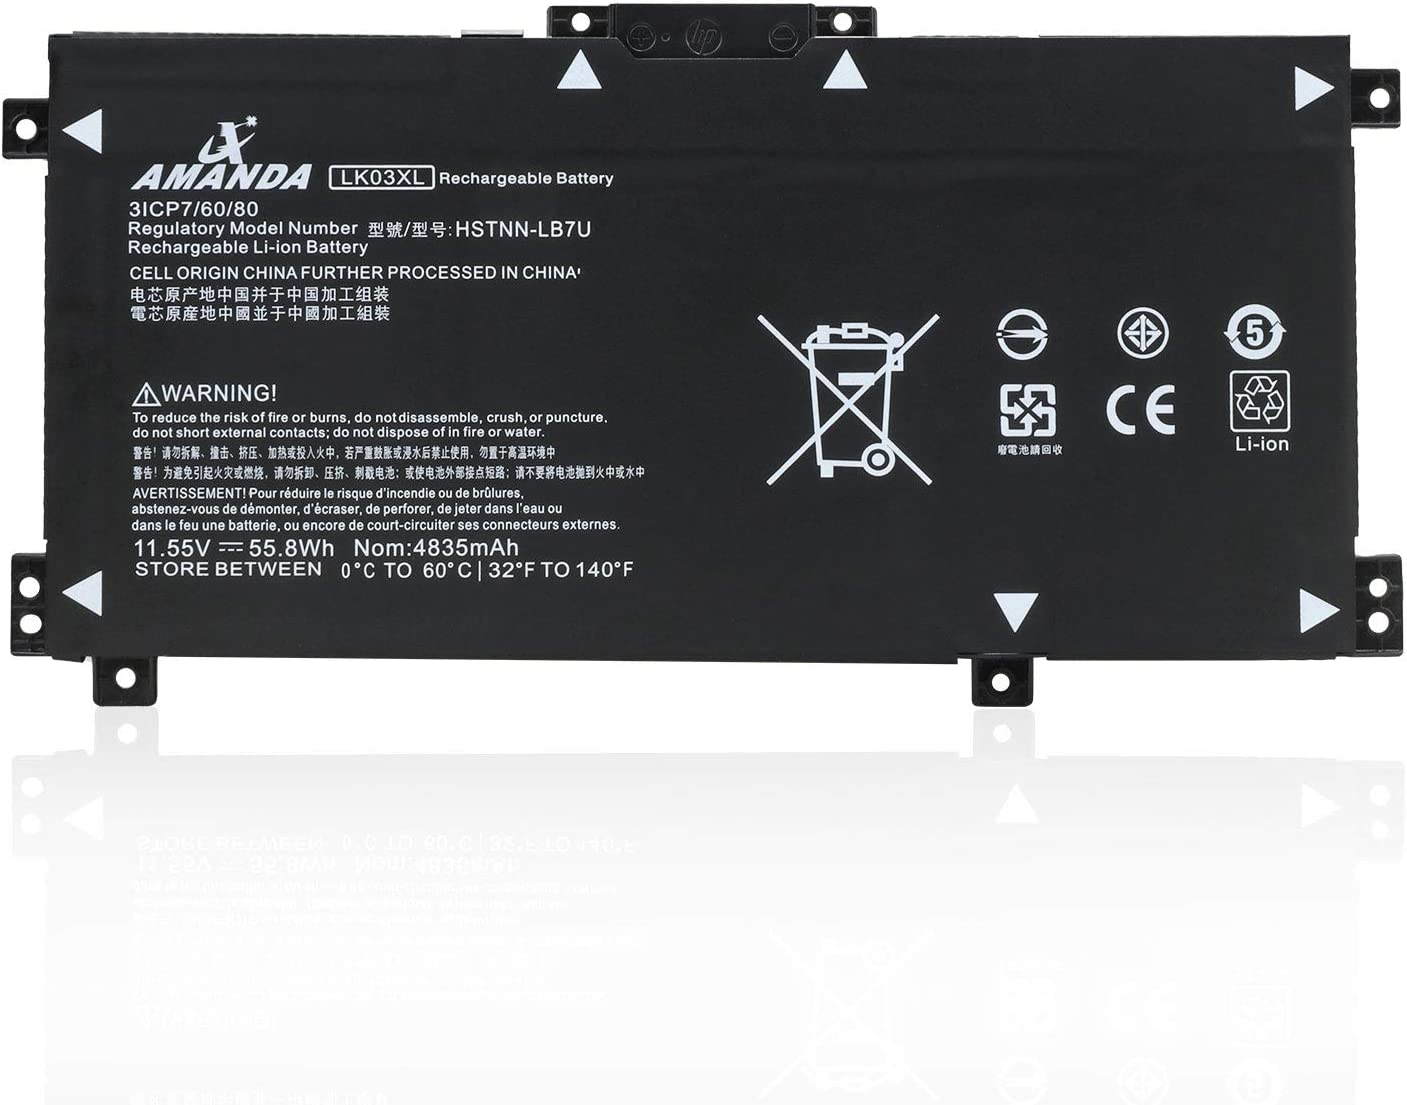 Amanda New LK03XL Laptop Battery 11.55V 55.8Wh Replacement for HP Envy 17 17-AE143NG 17M-AE0XX 17M-AE011DX 17T-AE100 Envy X360 15M-BP000 15-BP000 15-BP107TX 15M-BP012DX 15-BP100TX 916368-541